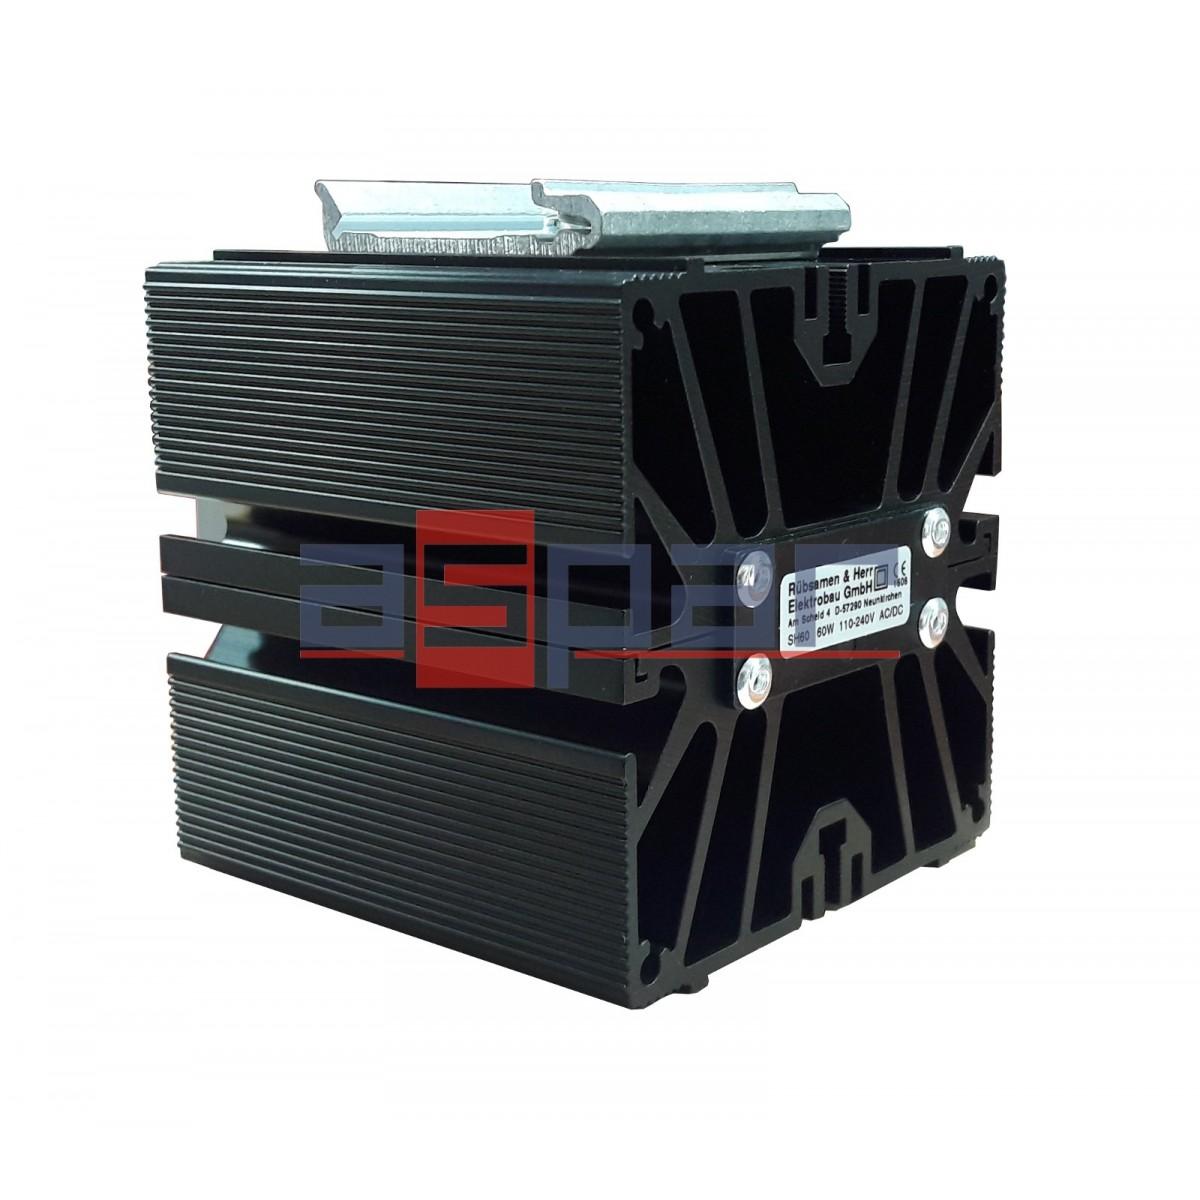 SH60 110-240V AC/DC - grzałka, 60W